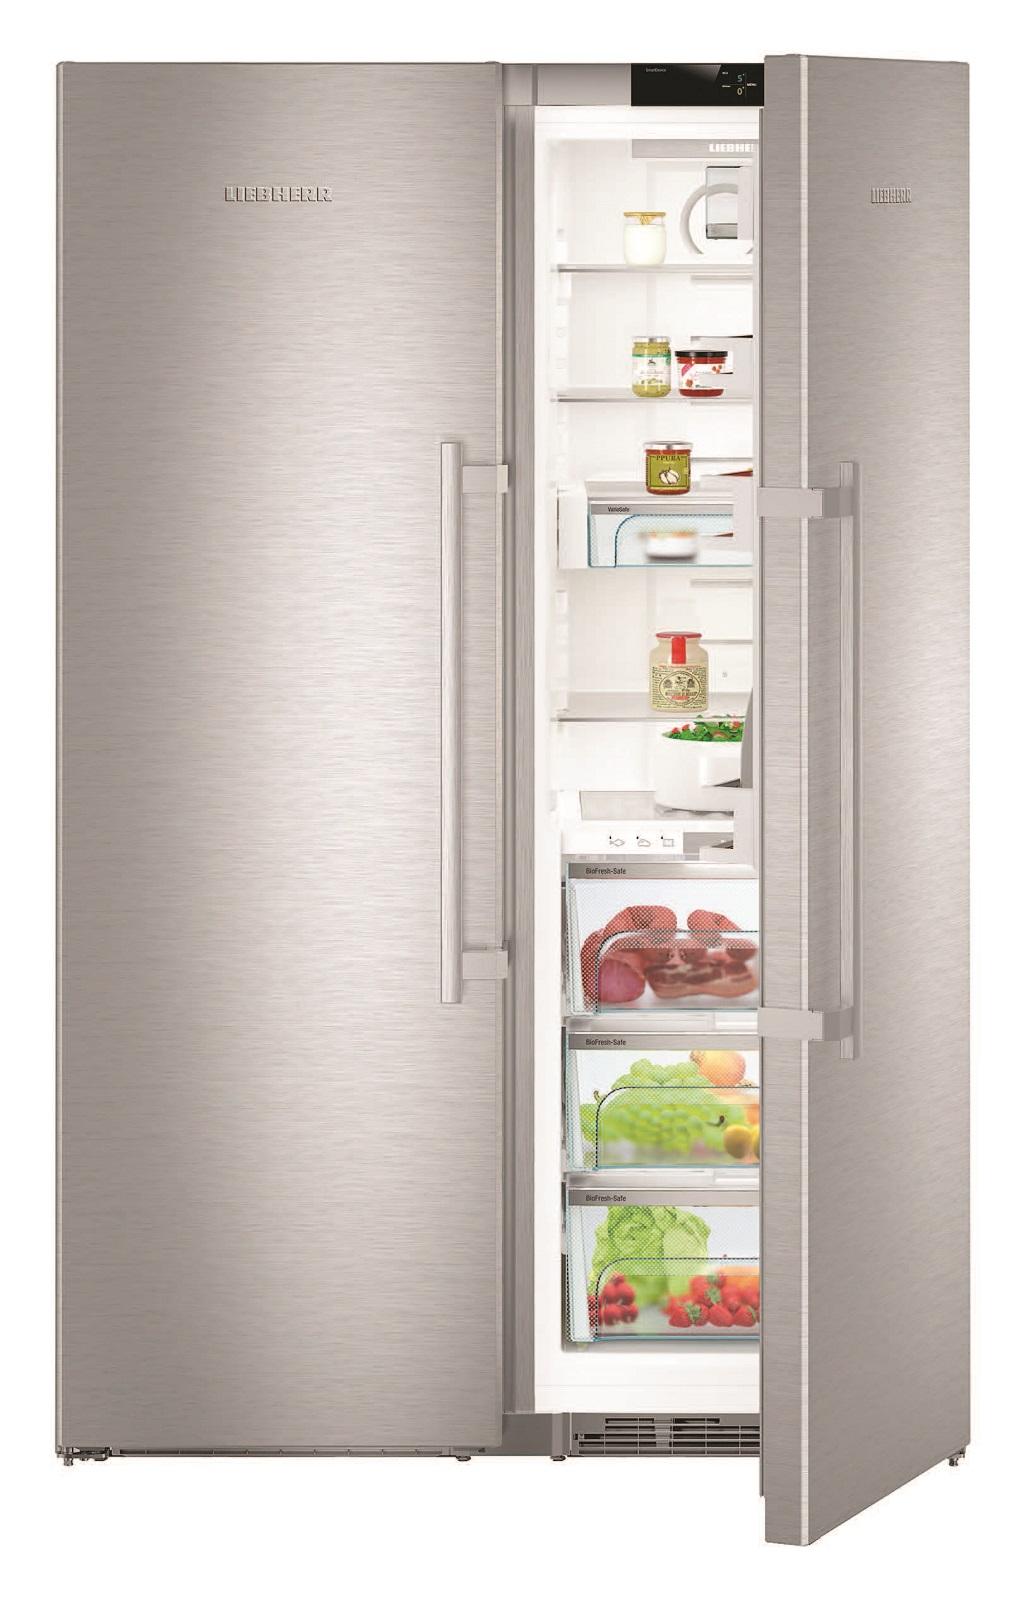 купить Side-by-Side холодильник Liebherr SBSes 8773 Украина фото 2